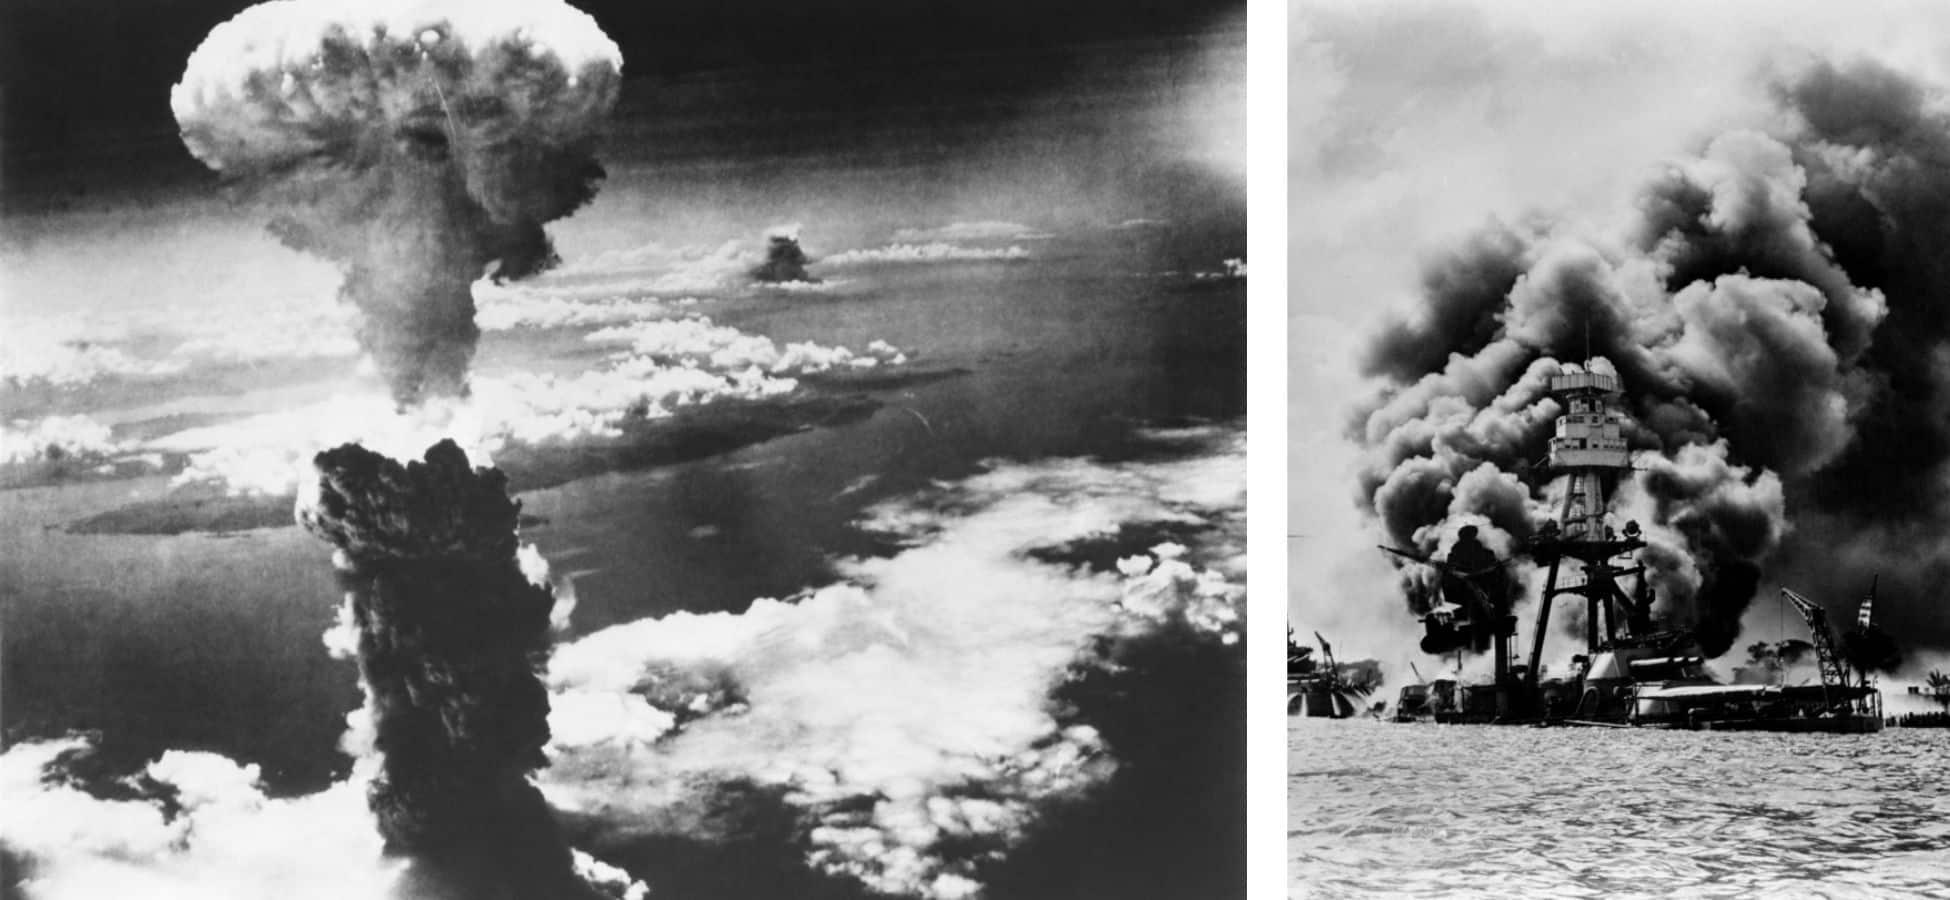 Template Japon Nagasaki et Pearl Harbor